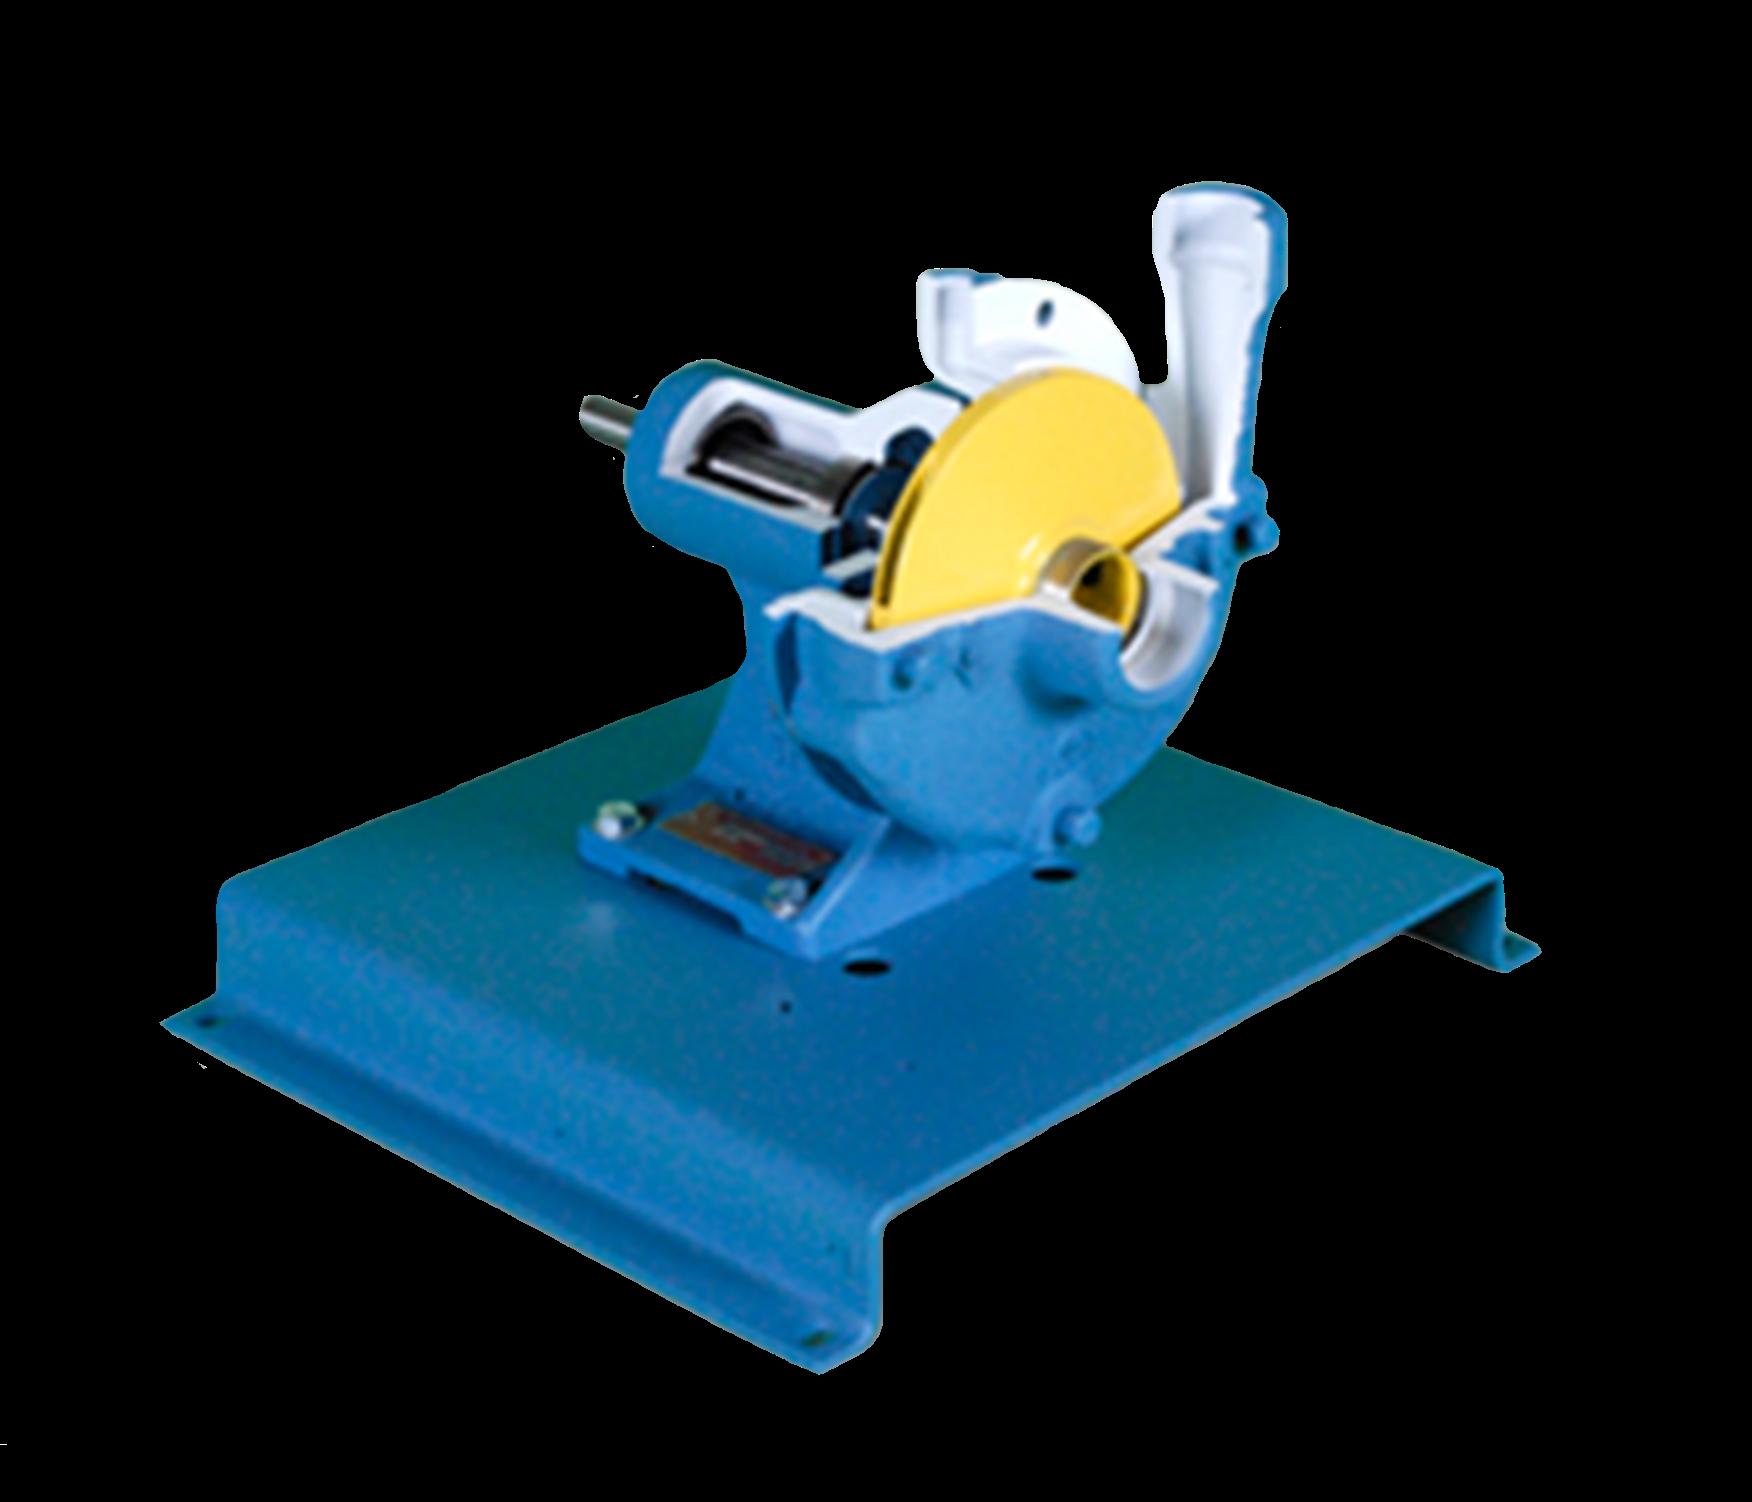 Centrifugal Pump Cutaway Training Image